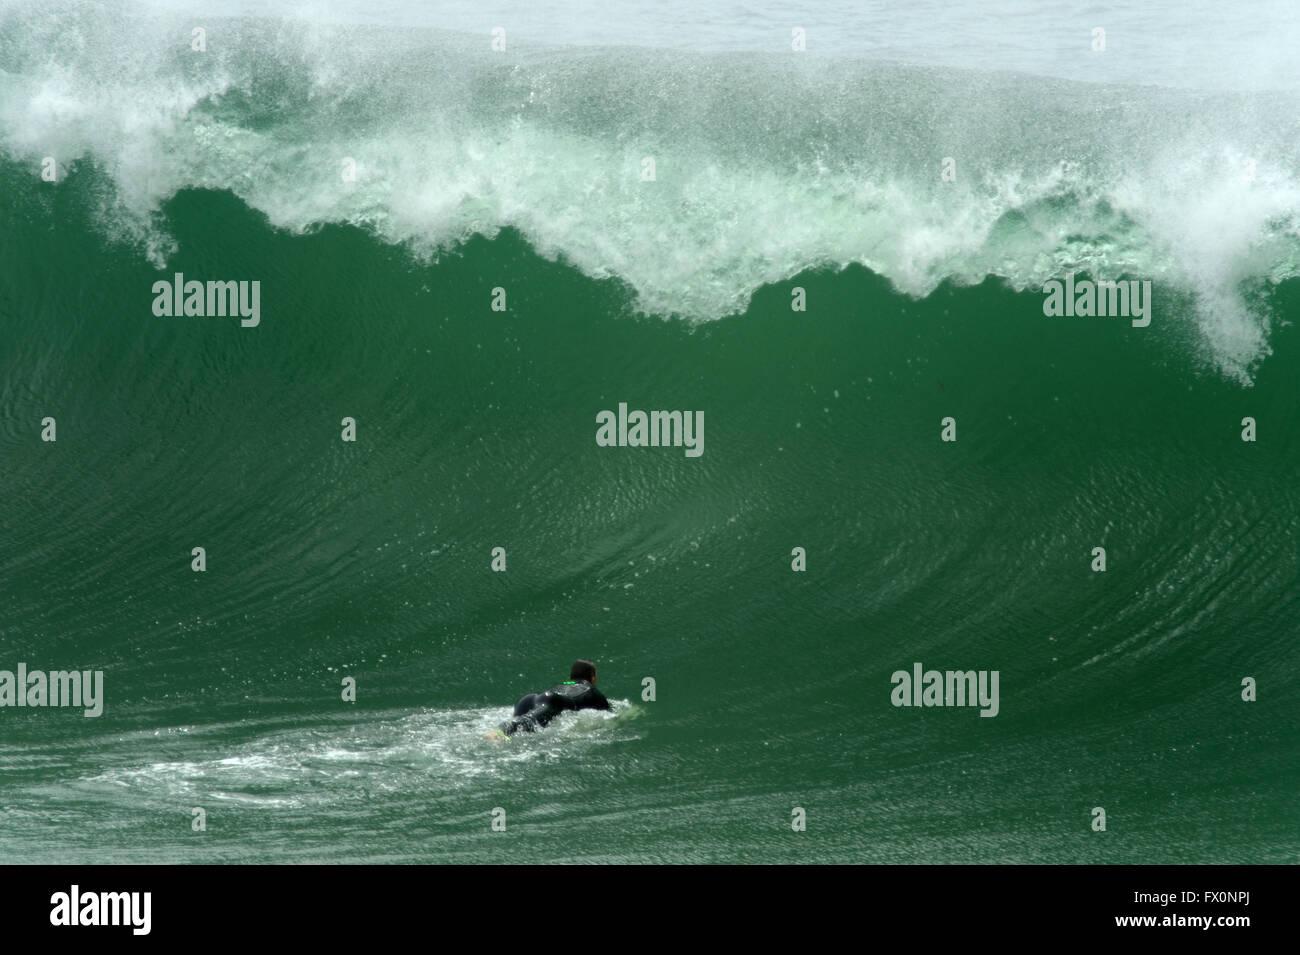 Surfer prepares to duck dive a large wave in the Algarve, Praia do Zavial - Stock Image